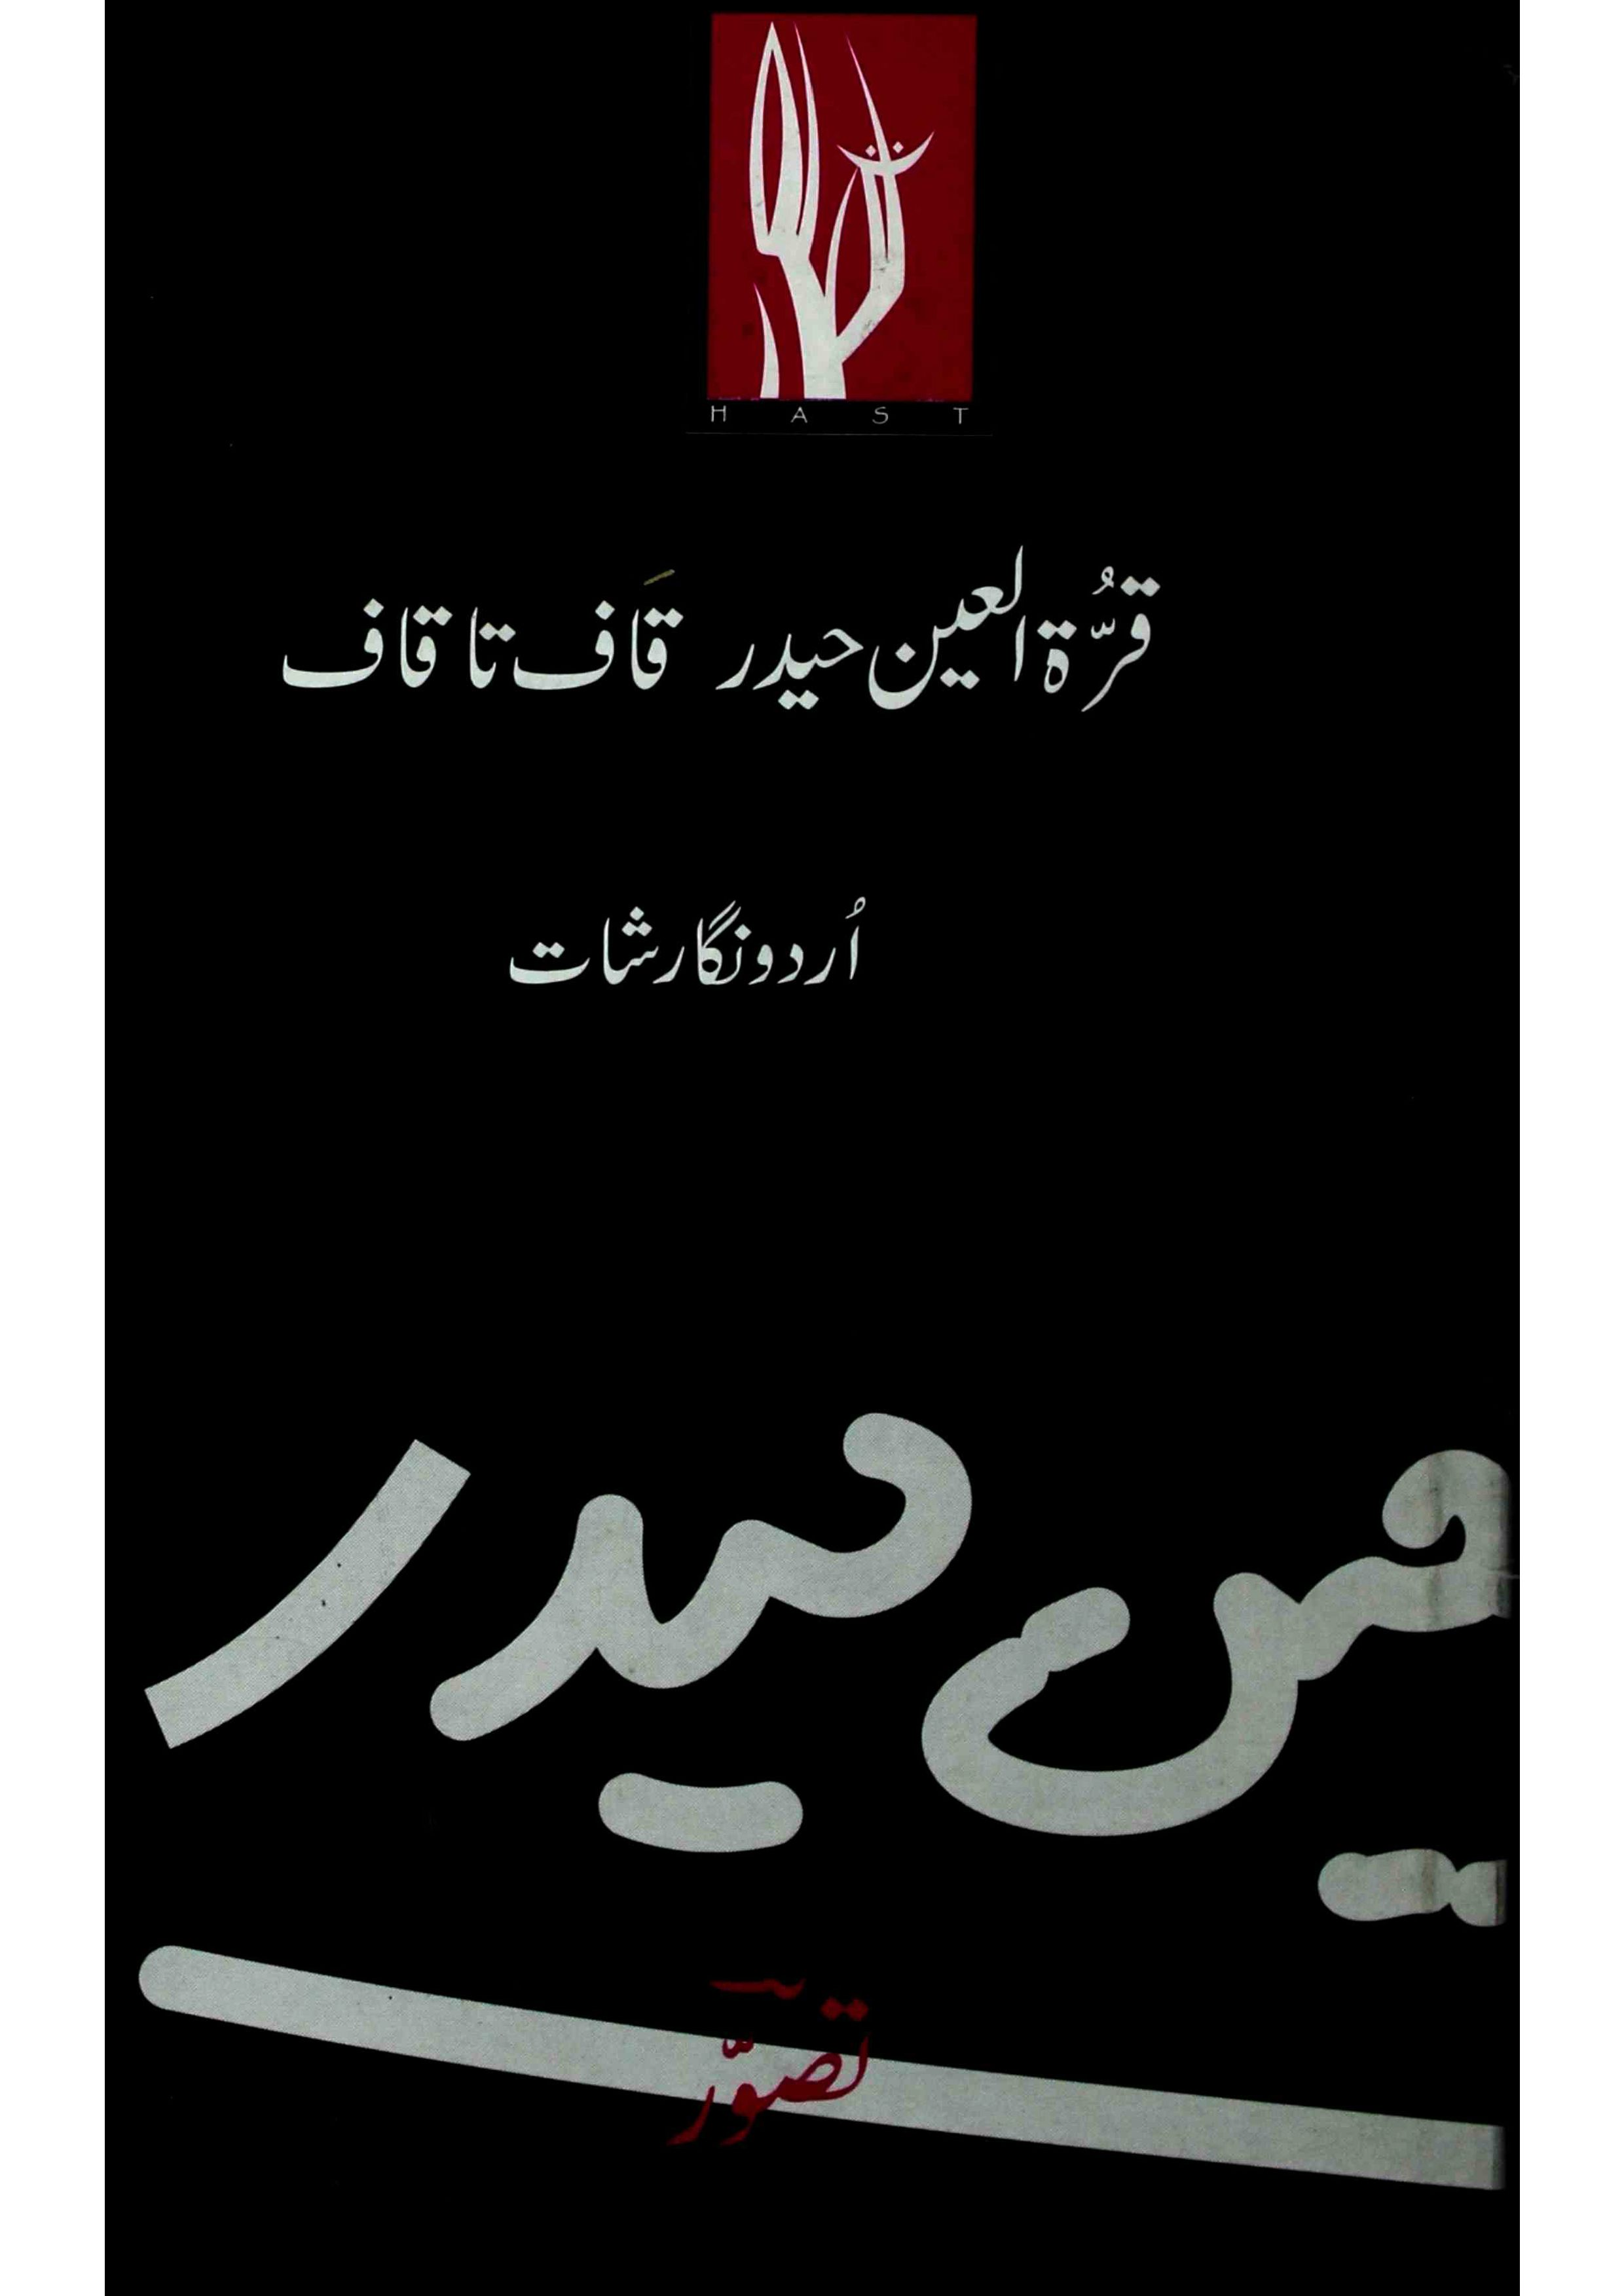 Qurratul Ain Hyder Qaaf Ta Qaaf     Urdu Nigarishat